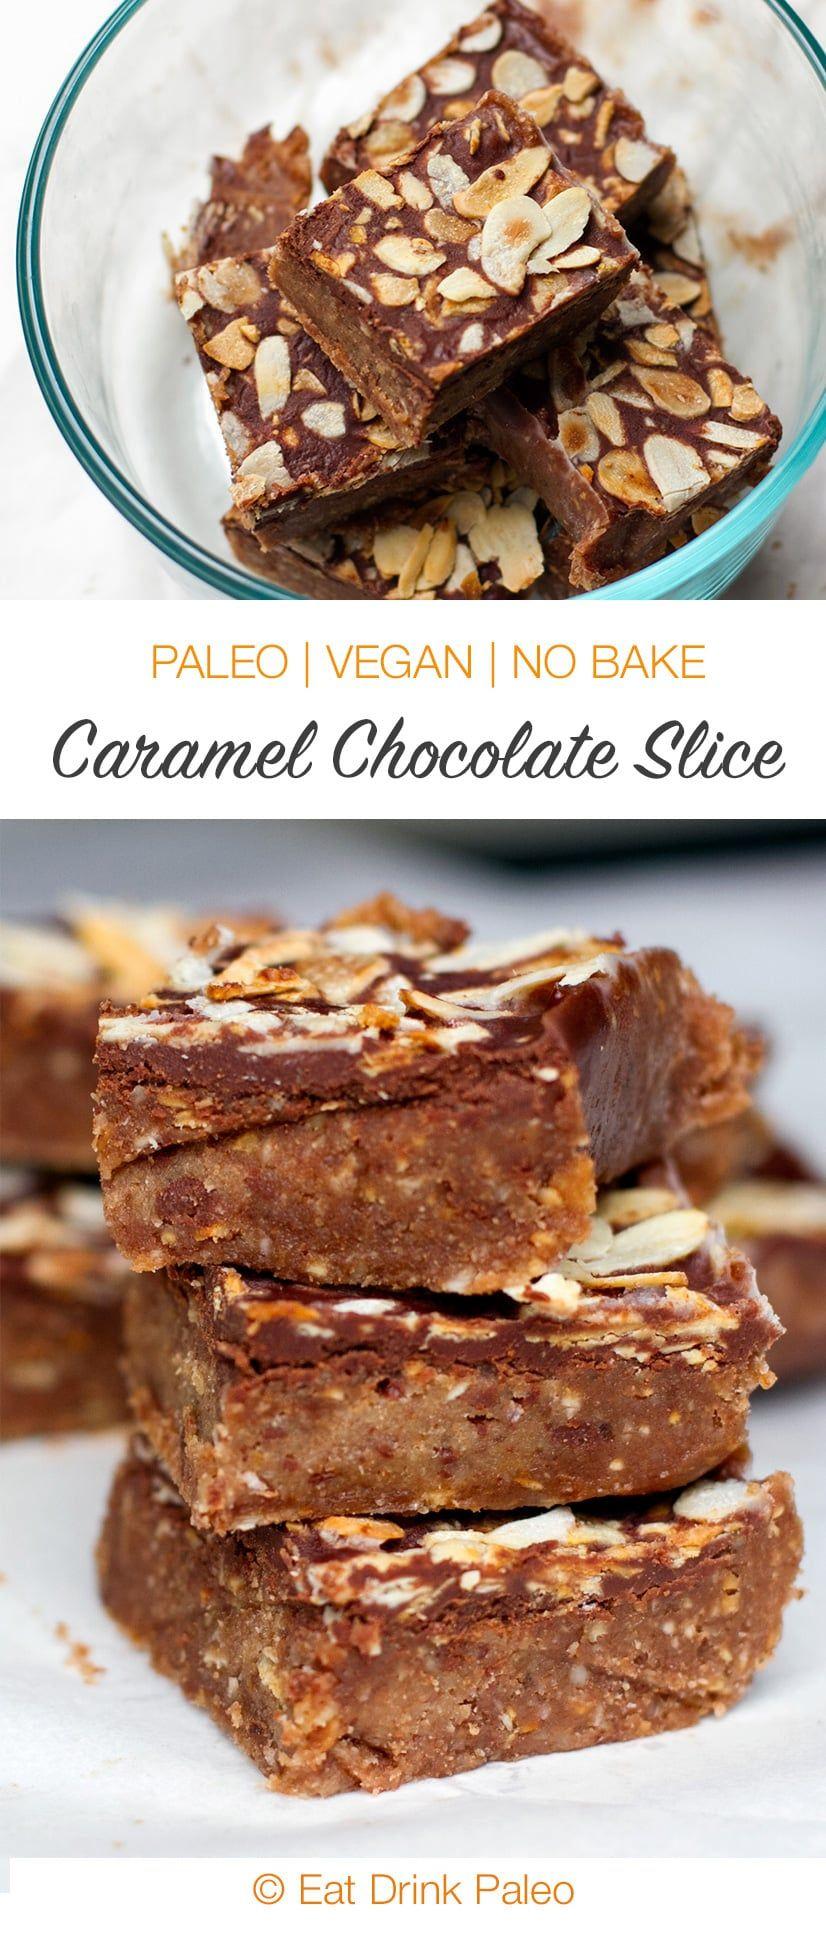 No Bake and No Fuss Caramel Chocolate Fudge Slice | Paleo, gluten free, vegan, no added refined sugar. Click here for recipe: http://eatdrinkpaleo.com.au/no-bake-paleo-caramel-chocolate-slice-recipe/